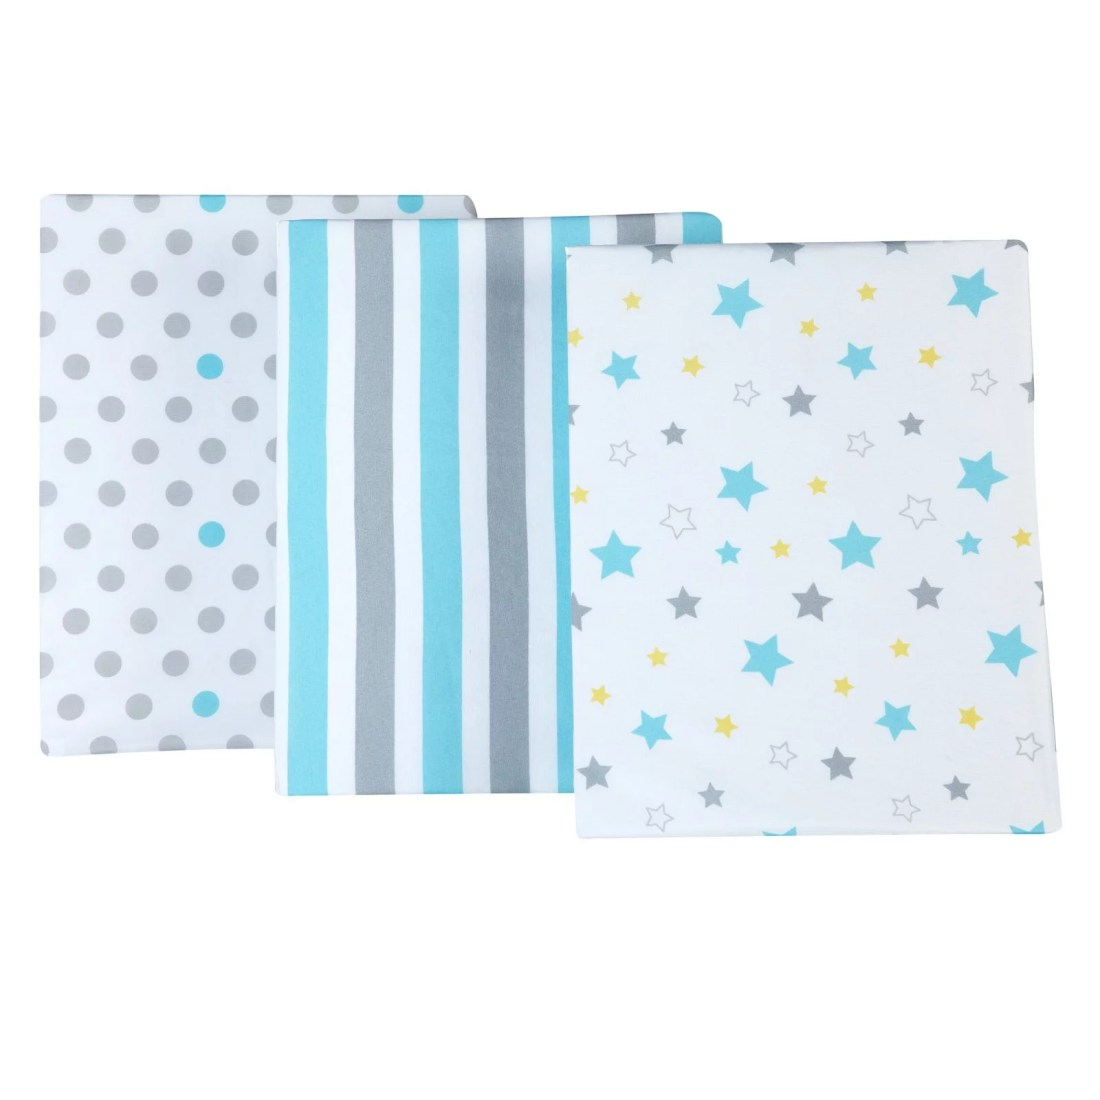 Nojo Cotton-Polyester Crib Sheets, Twinkle Twinkle 3pk